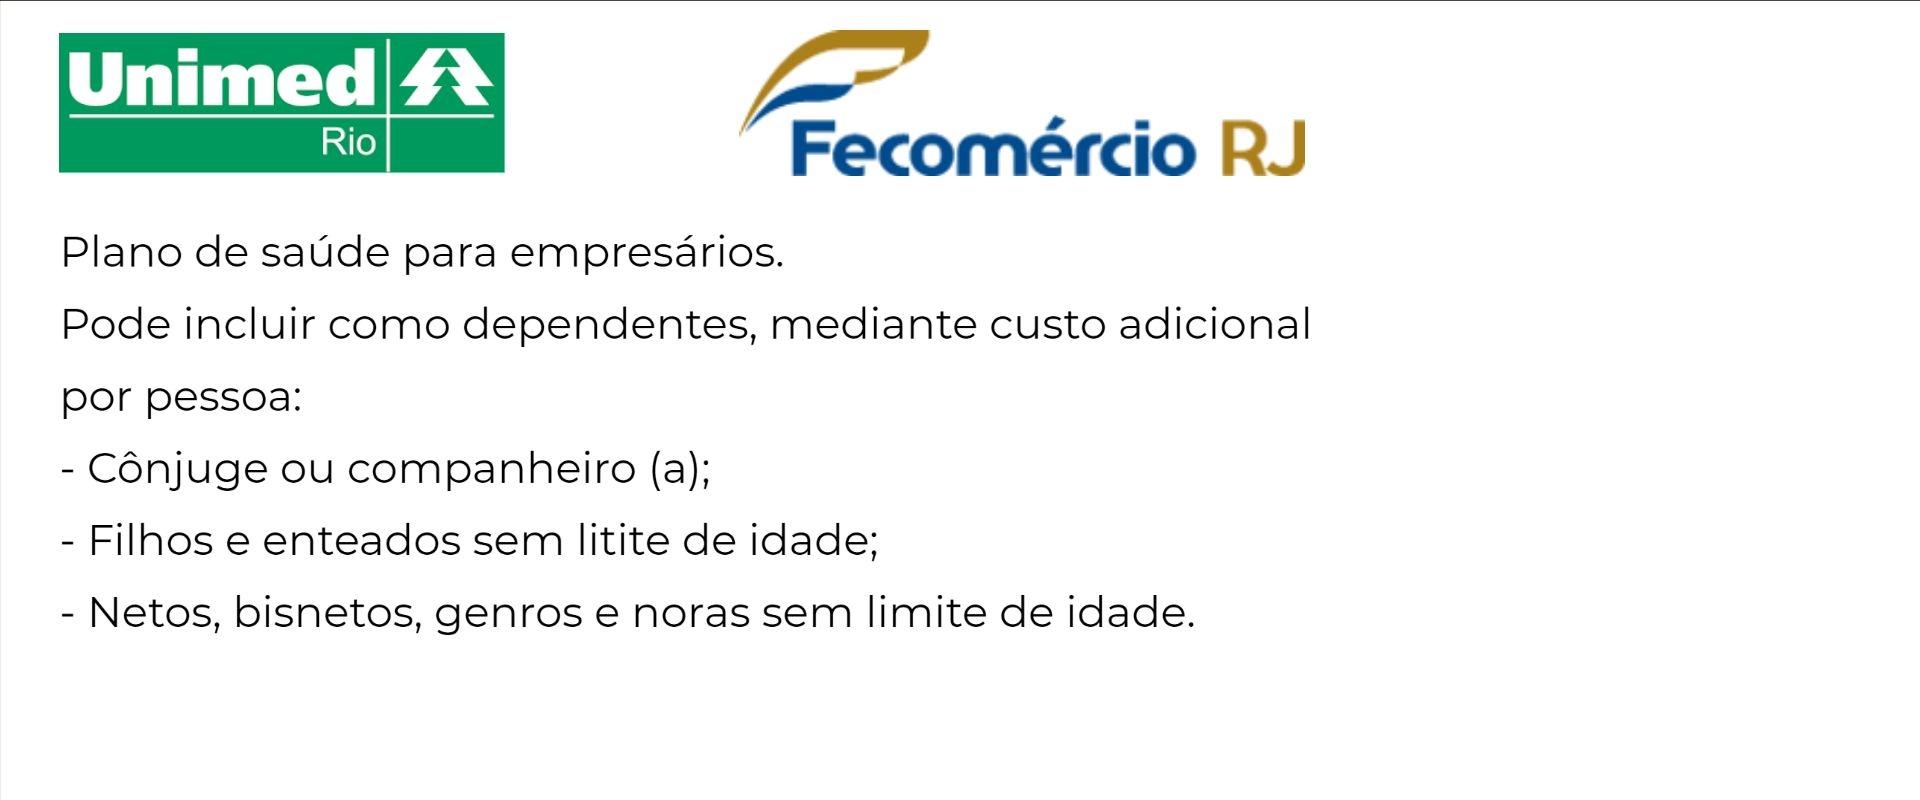 Unimed Rio Fecomércio-RJ